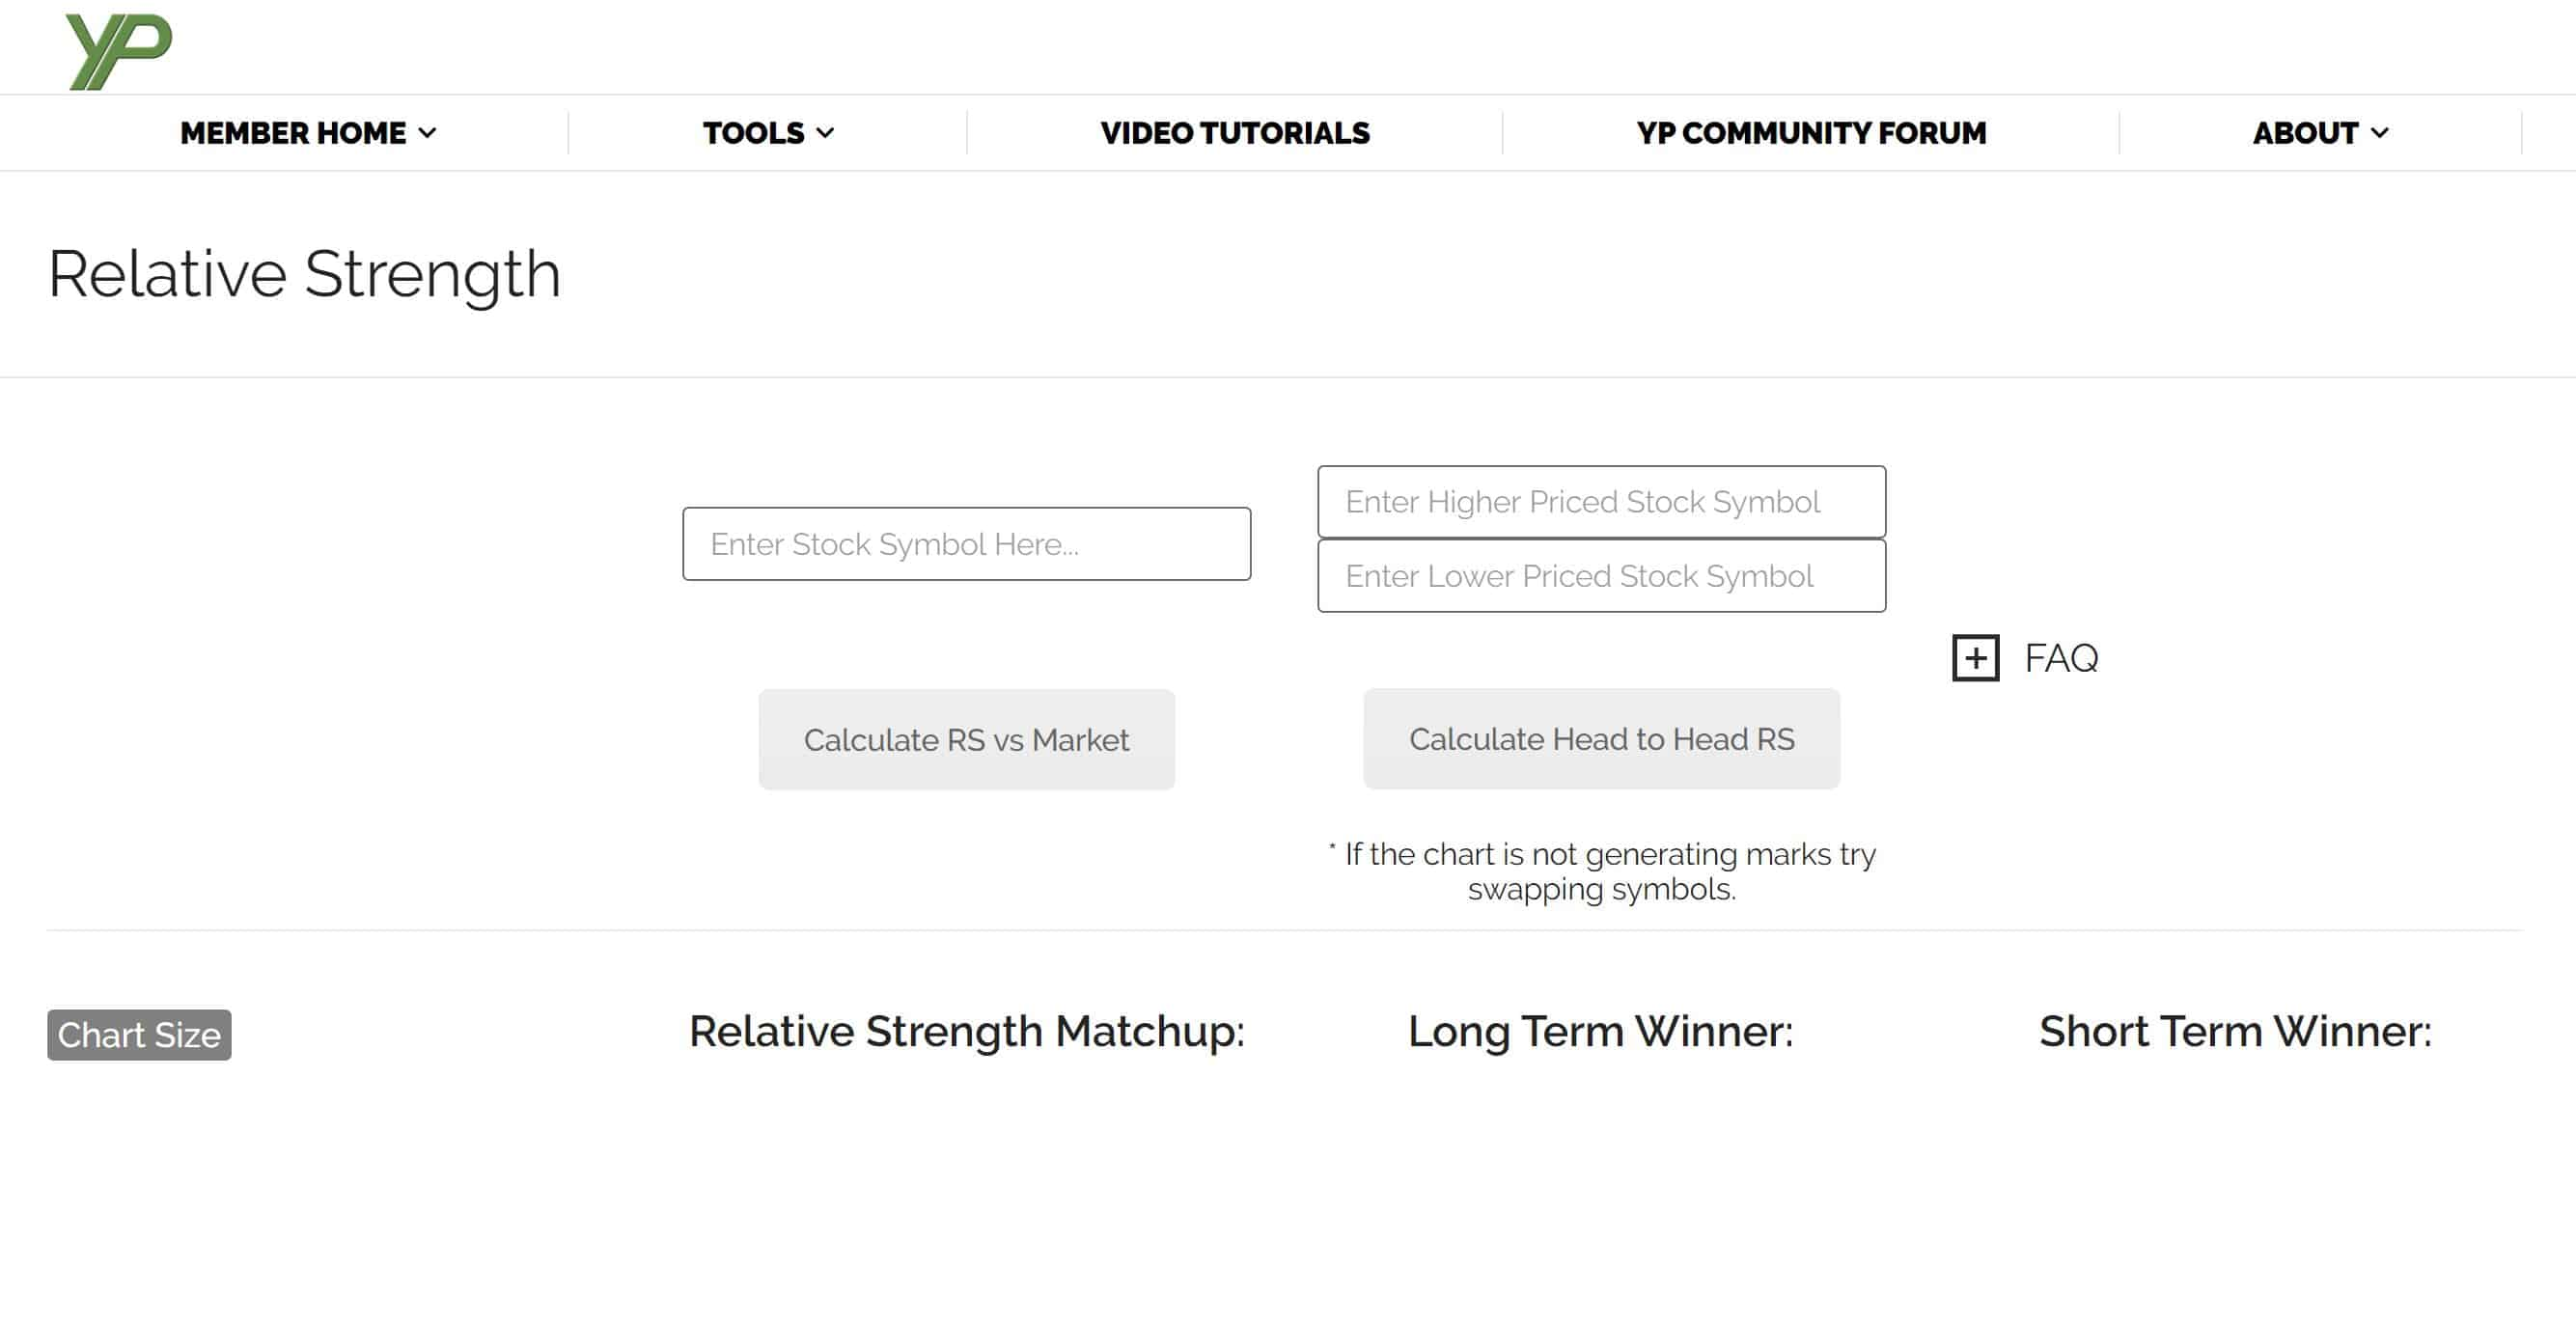 Relative Strength Tool